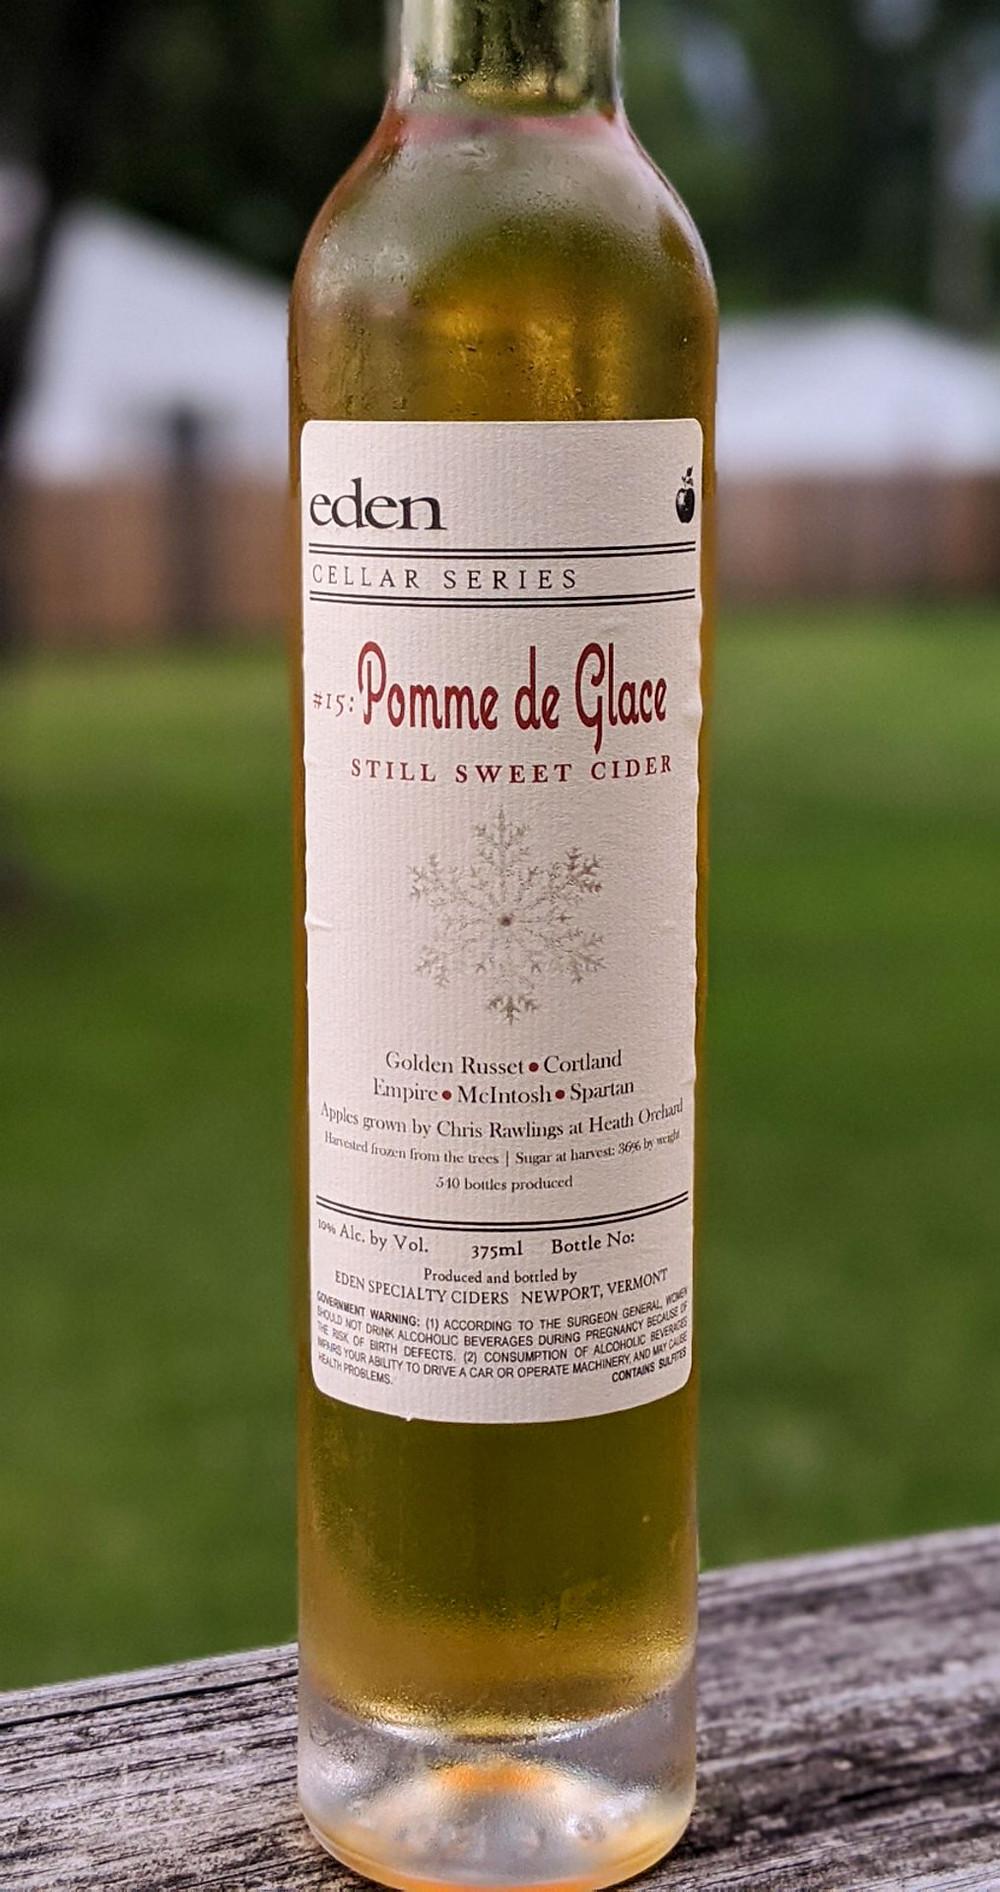 Eden Cider Pomme de Glace